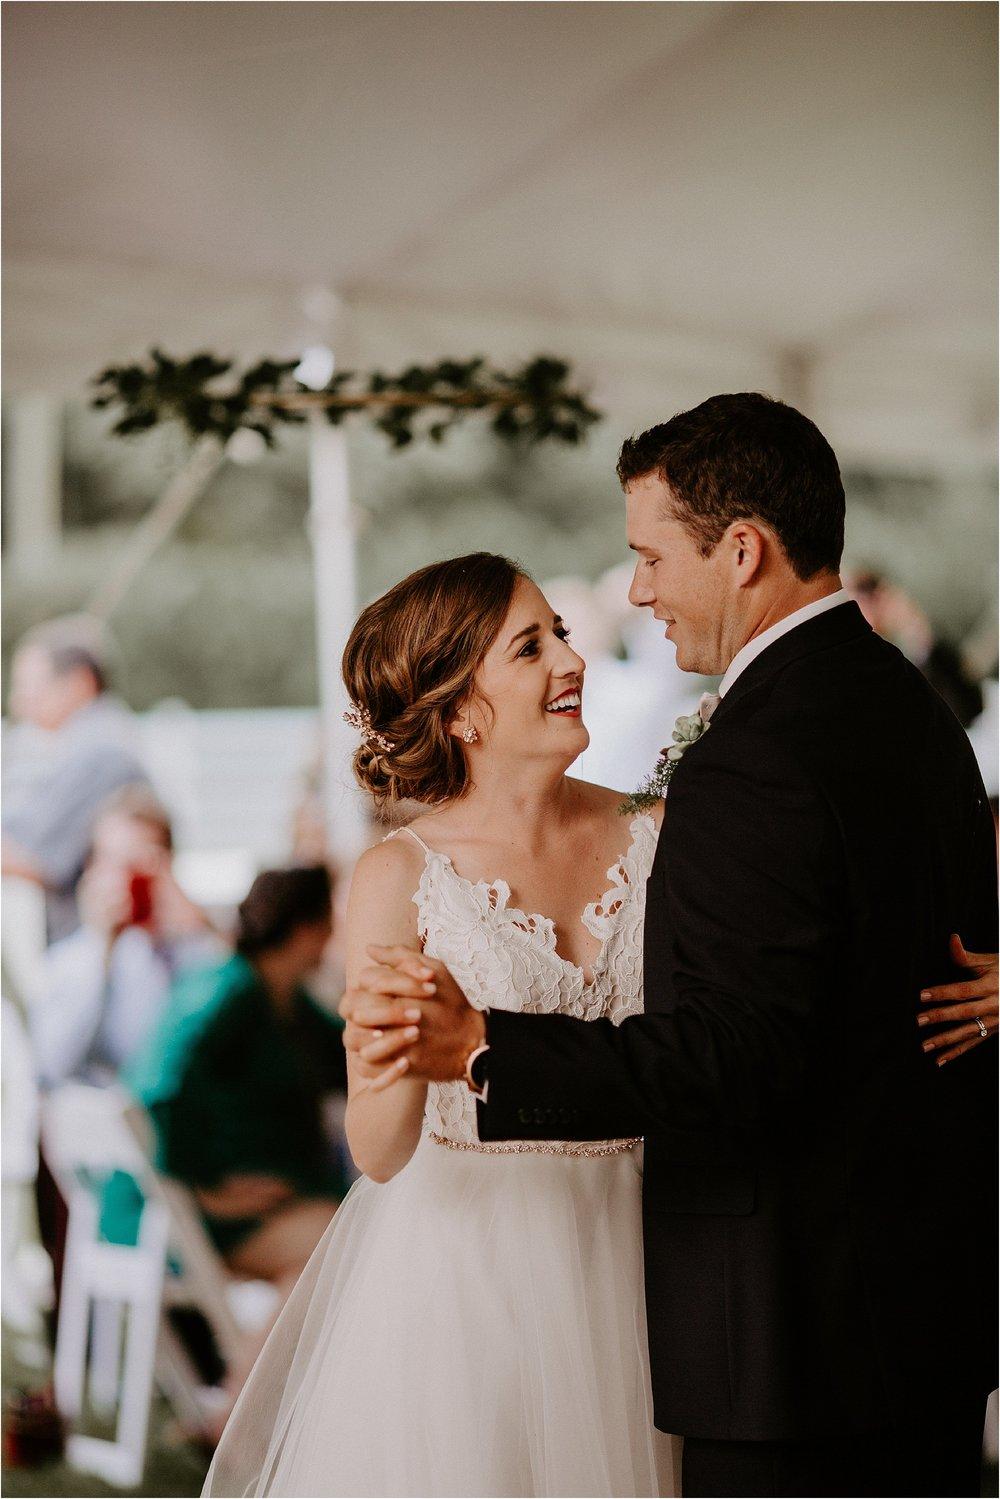 Sarah_Brookhart_Lancaster_Wedding_Photographer_0070.jpg